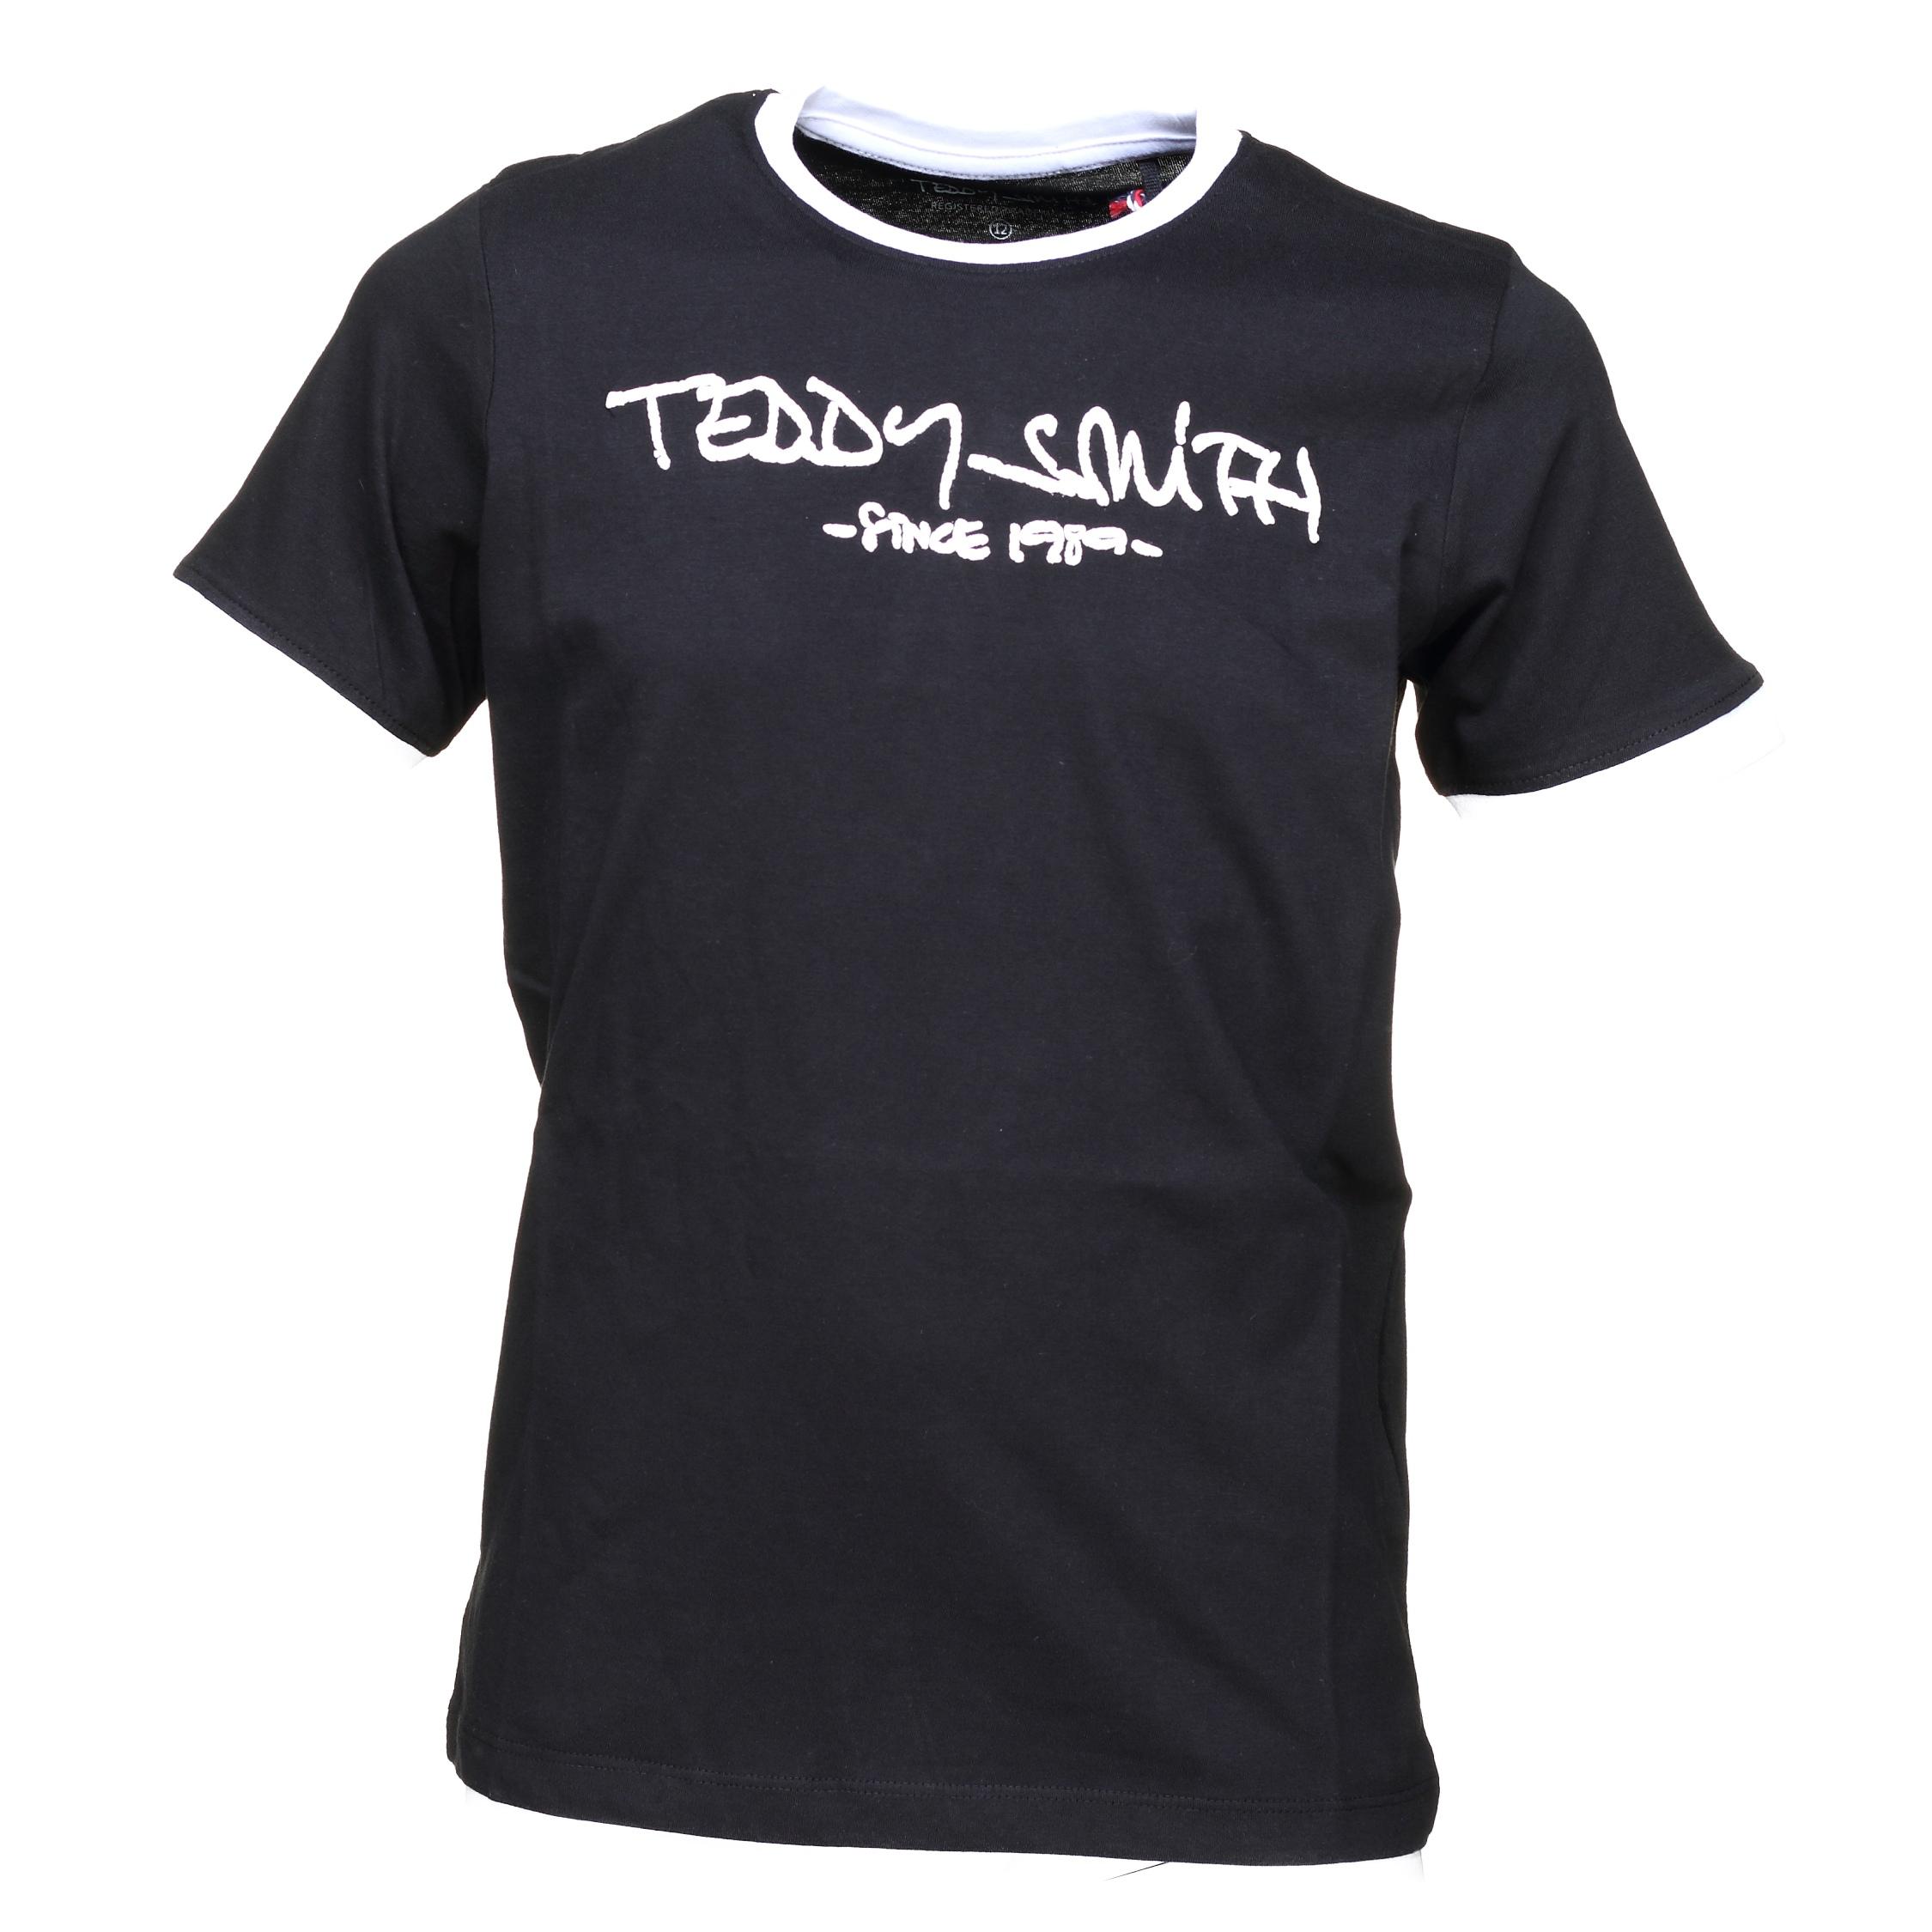 http://www.leadermode.com/176580/teddy-smith-ticlass3-mc-61002433d-171z4-noir-blanc.jpg